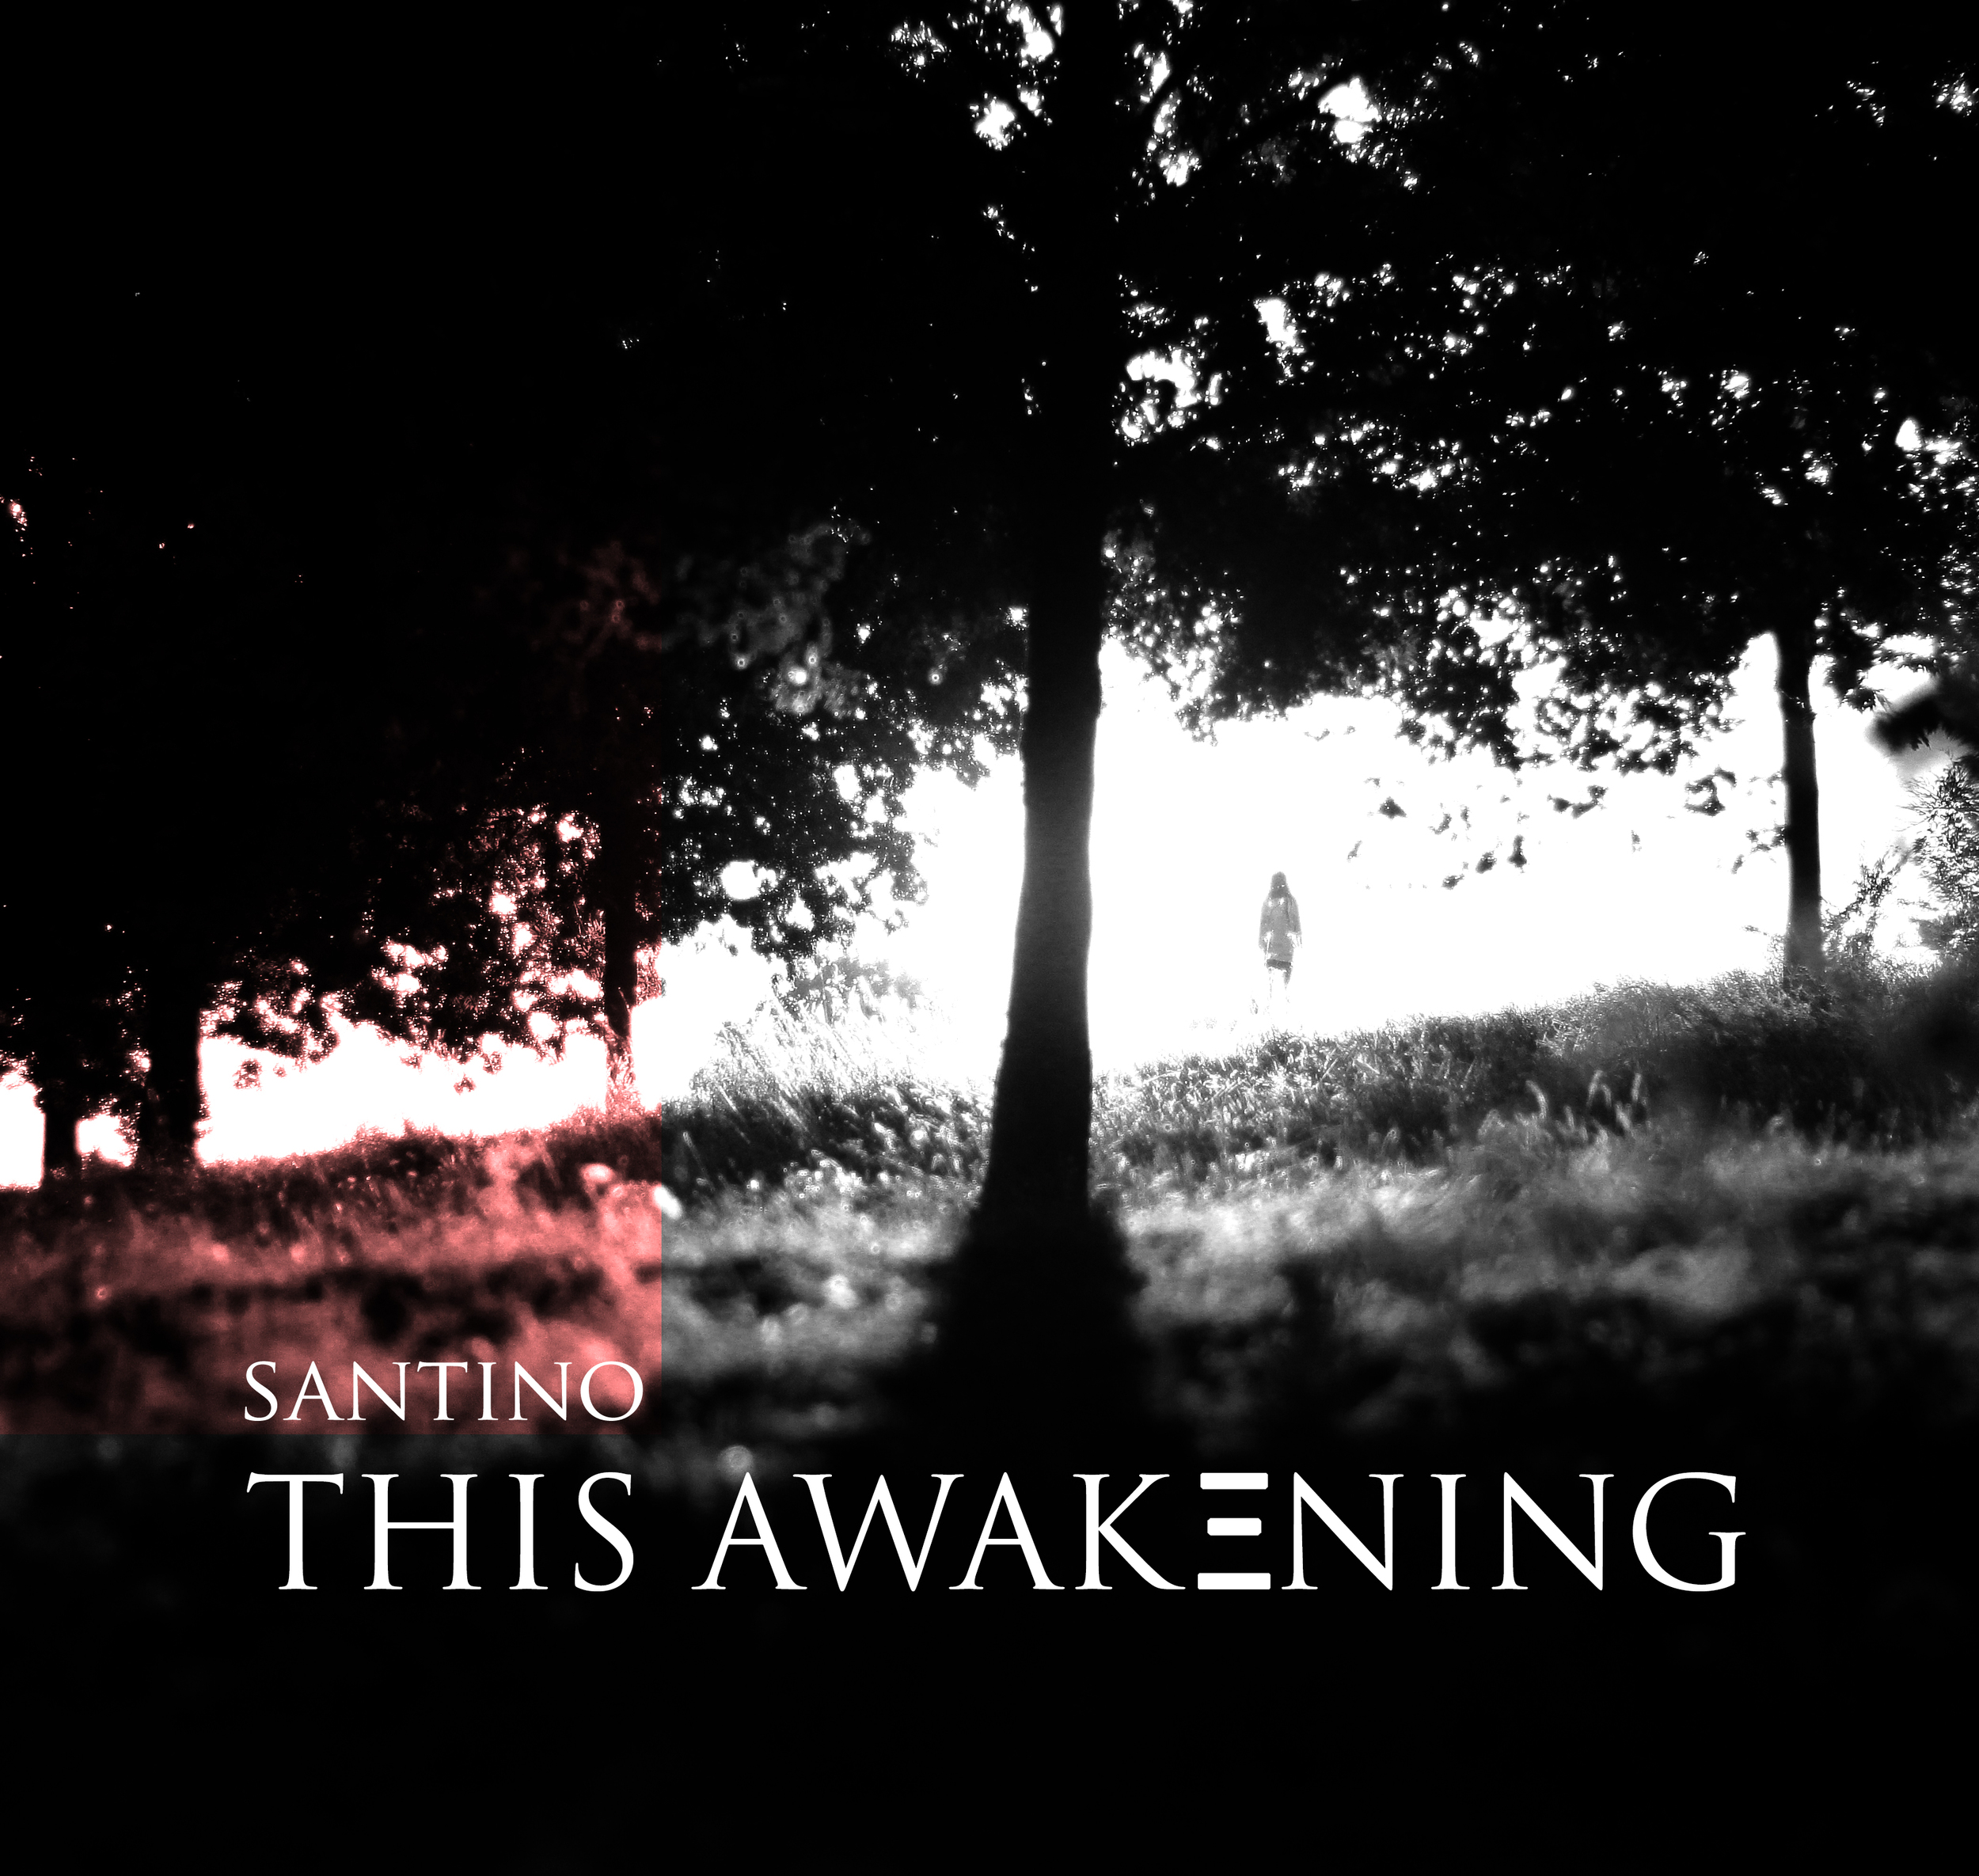 This-Awakening-v8.jpg